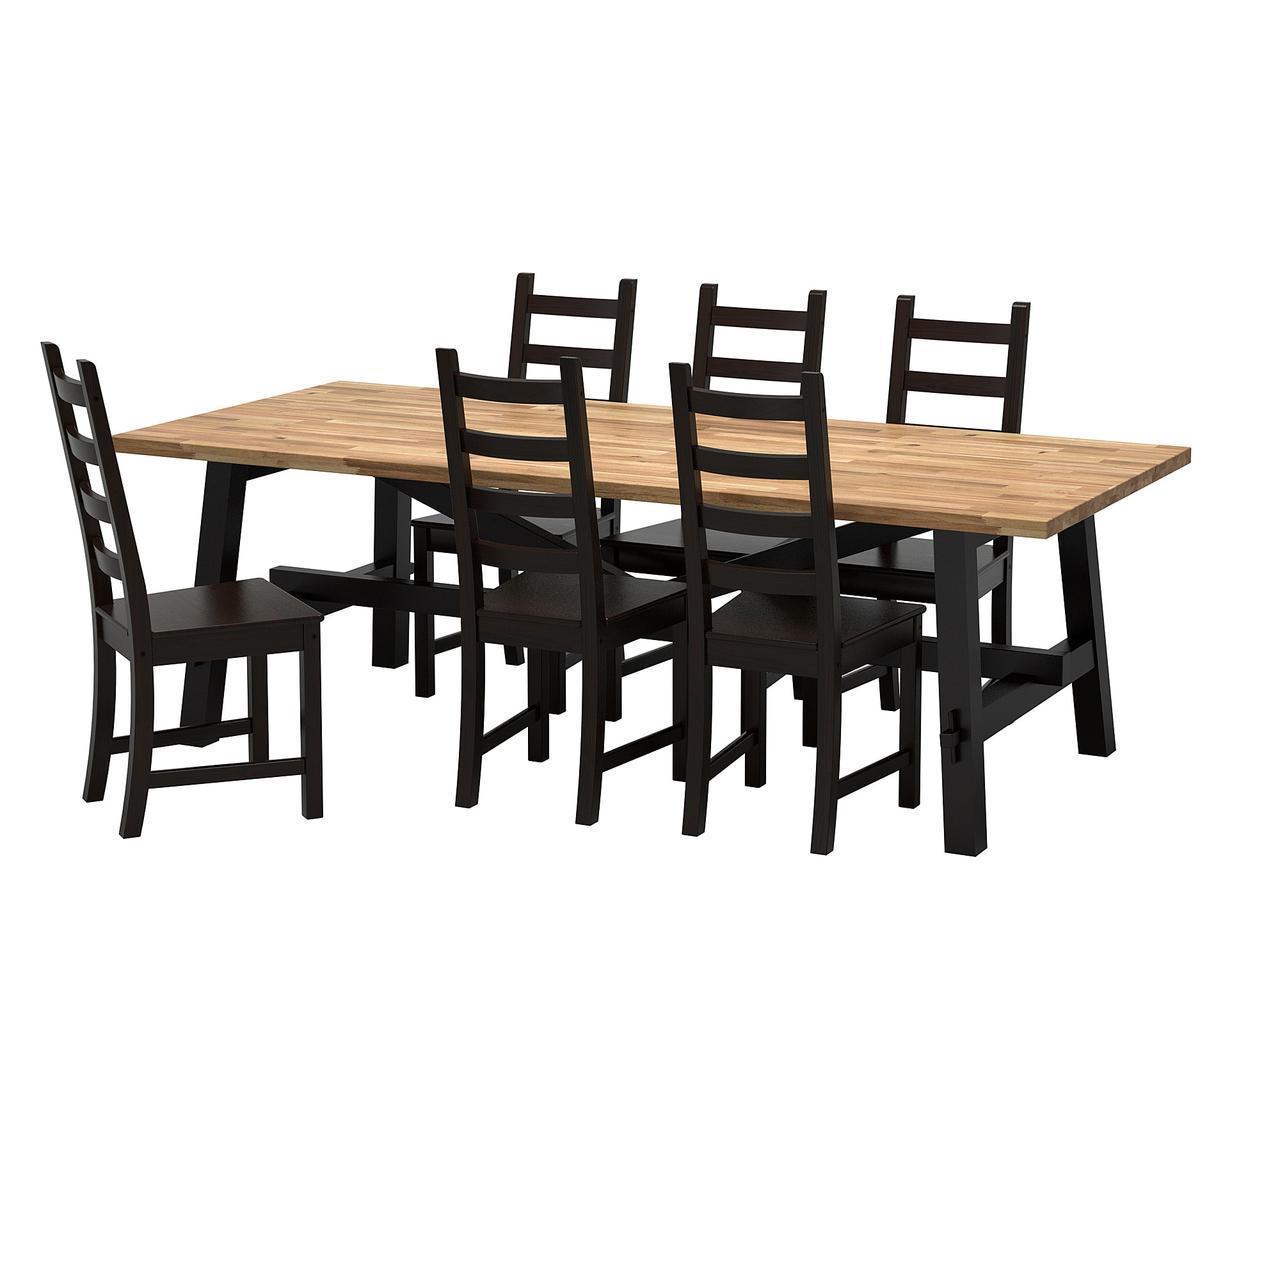 IKEA SKOGSTA/KAUSTBY Стол и 6 стульев, акация, коричневый  (492.462.94)